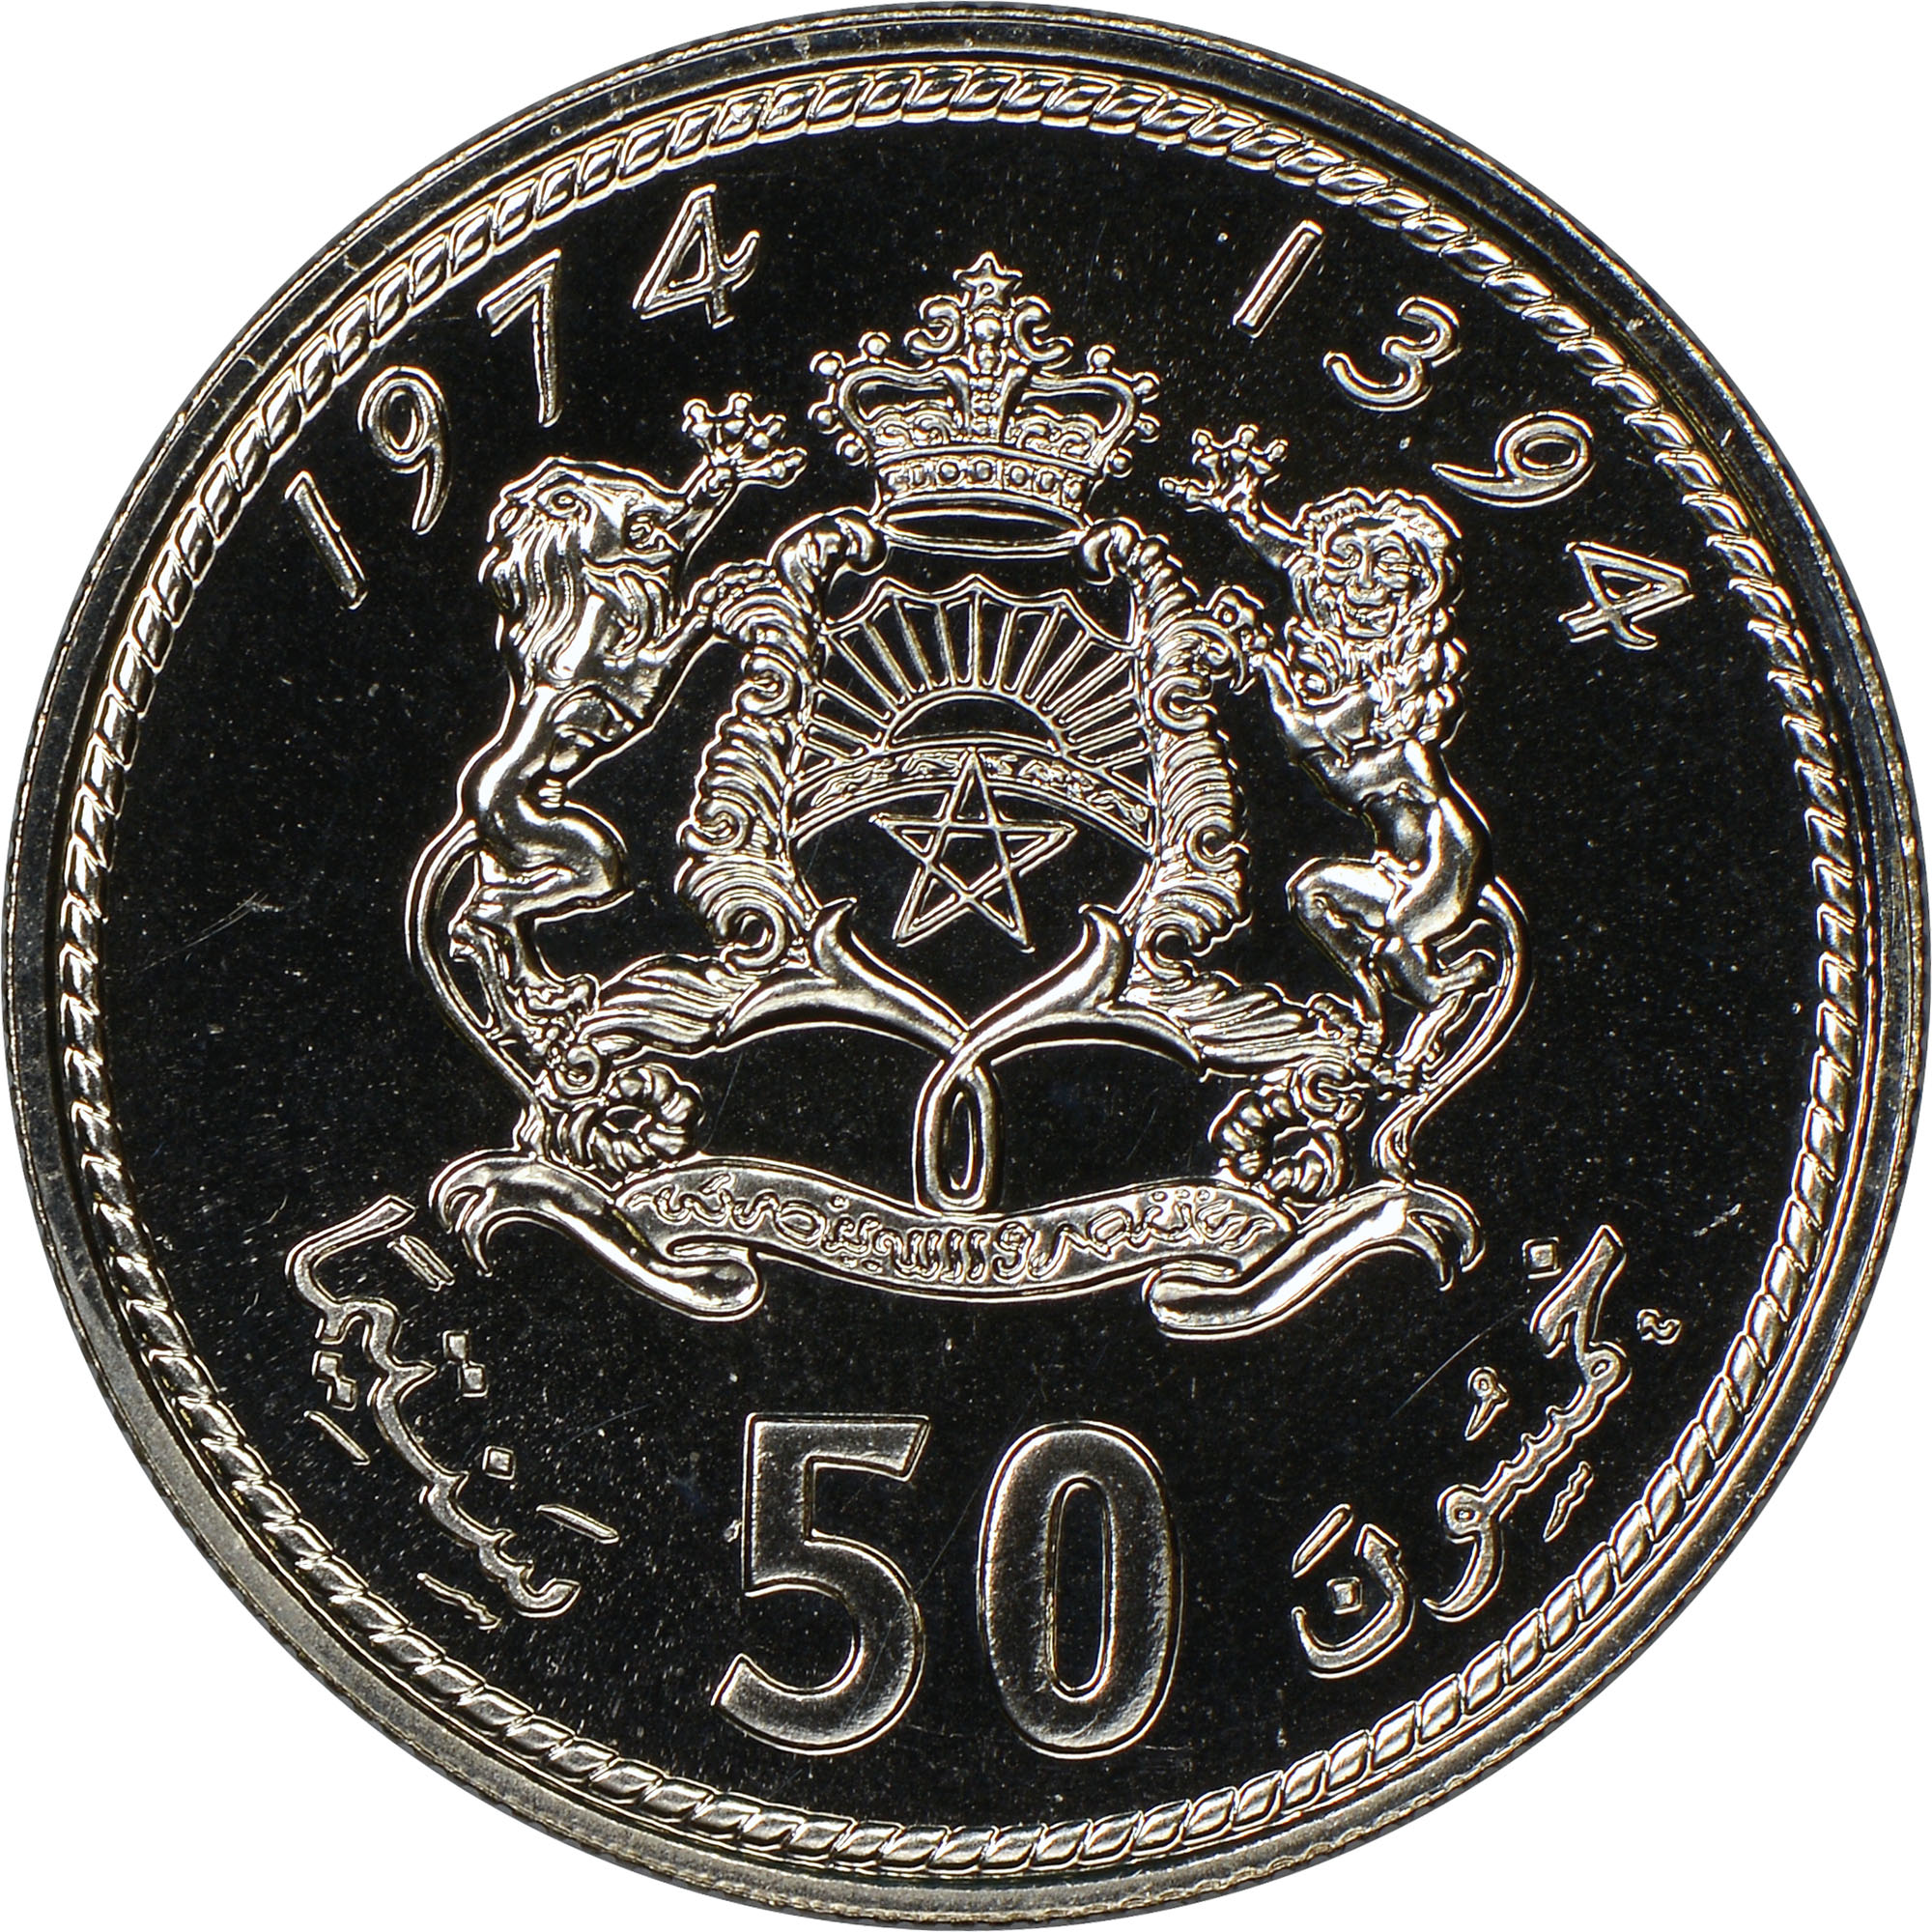 Morocco 50 Santimat reverse